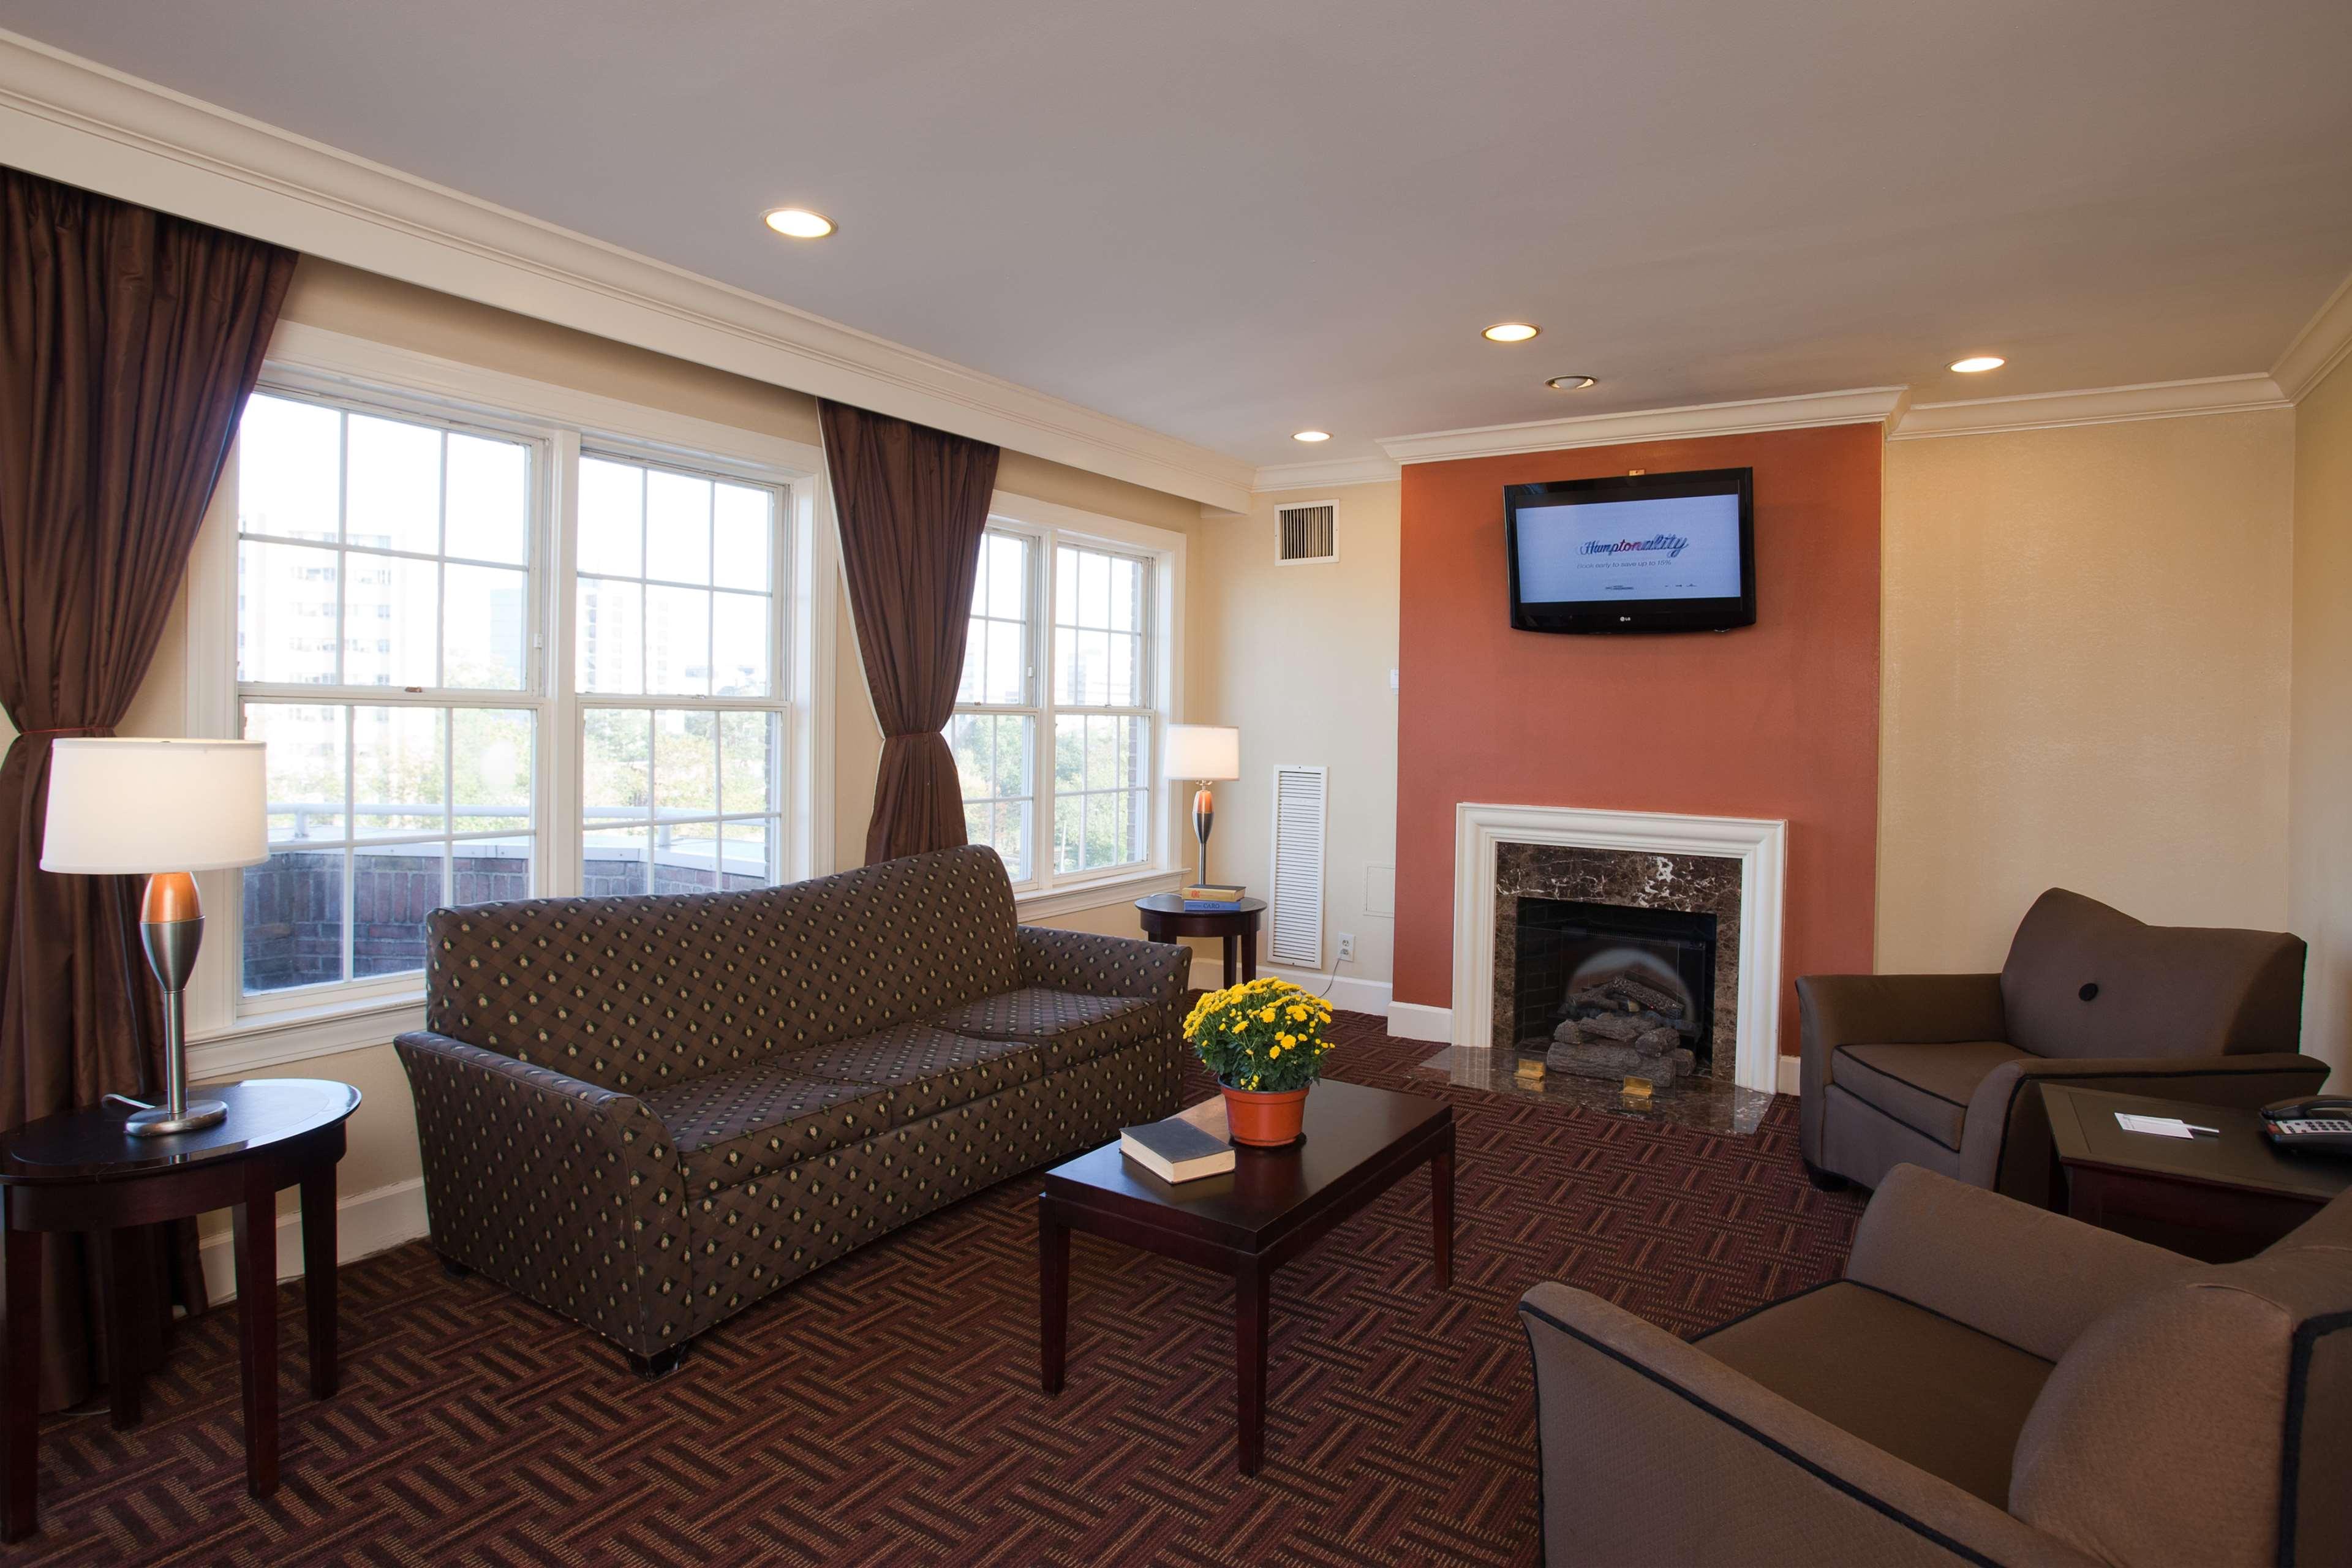 Hampton Inn & Suites Stamford image 37